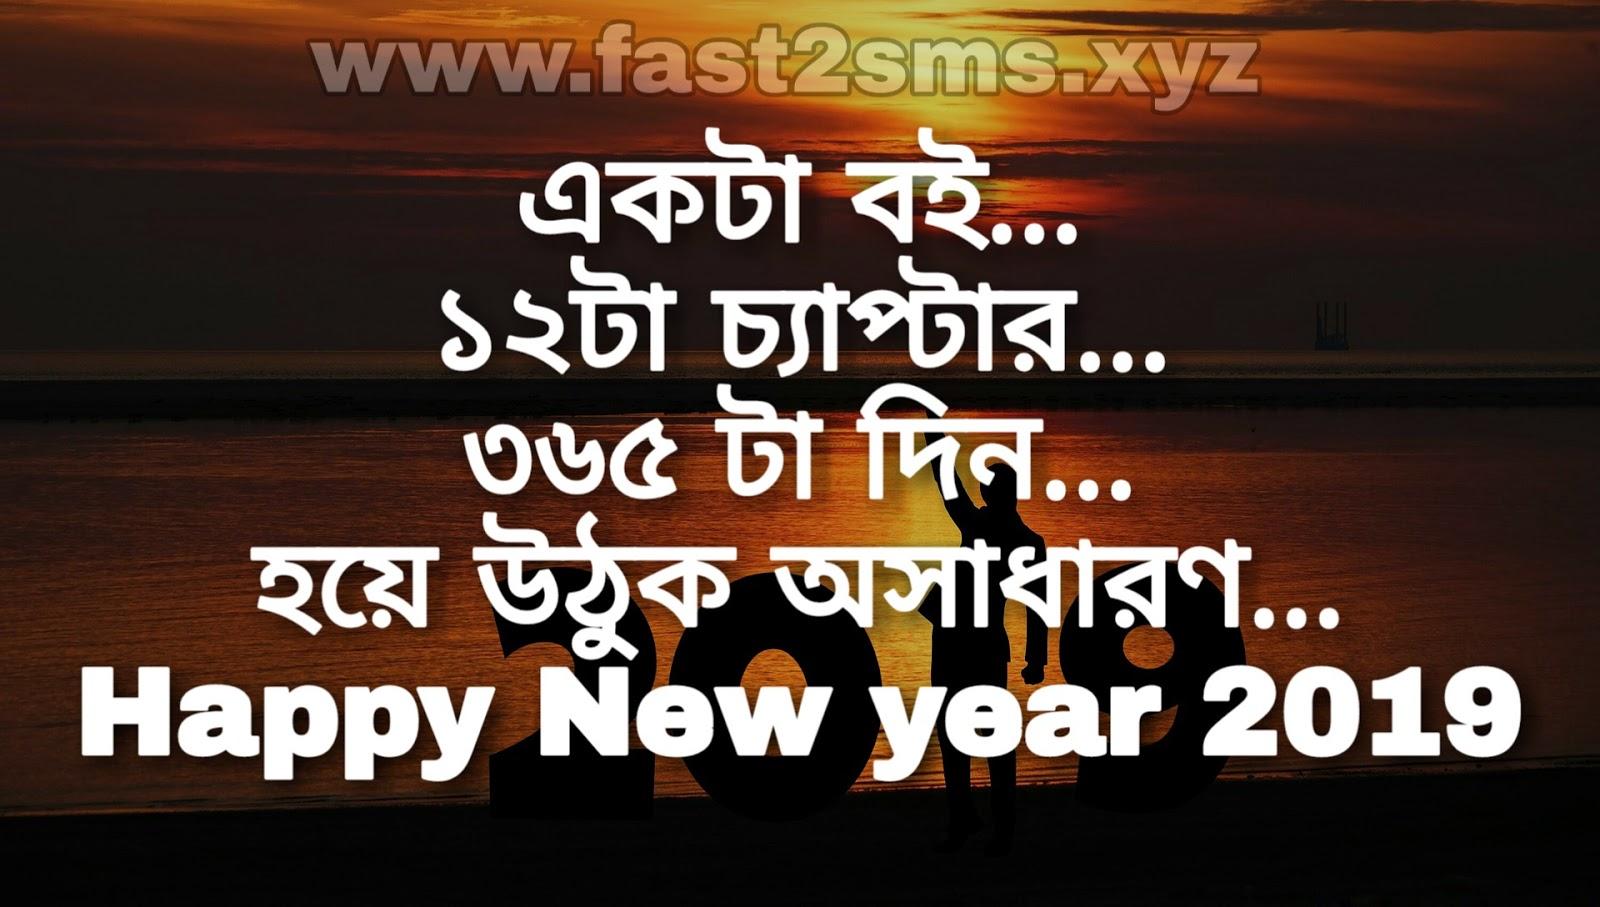 Happy Bengali New Year 1422 fb post in 2019